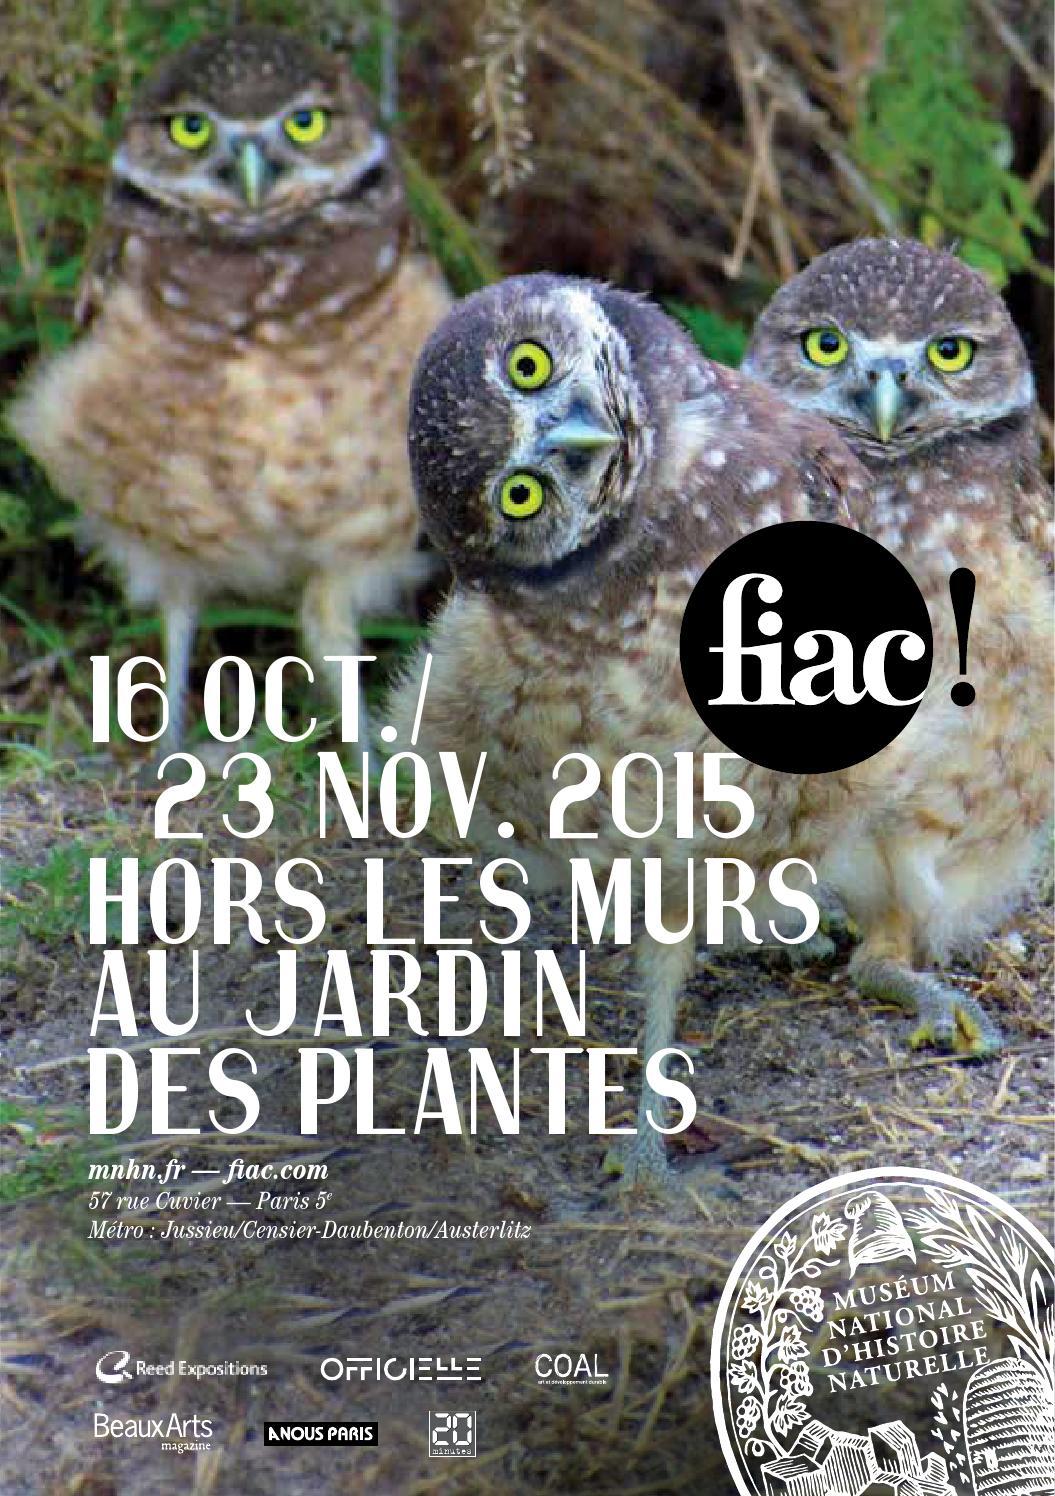 La fiac 2015 au jardin des plantes by jason whittaker issuu for Fiac 2015 jardin des plantes